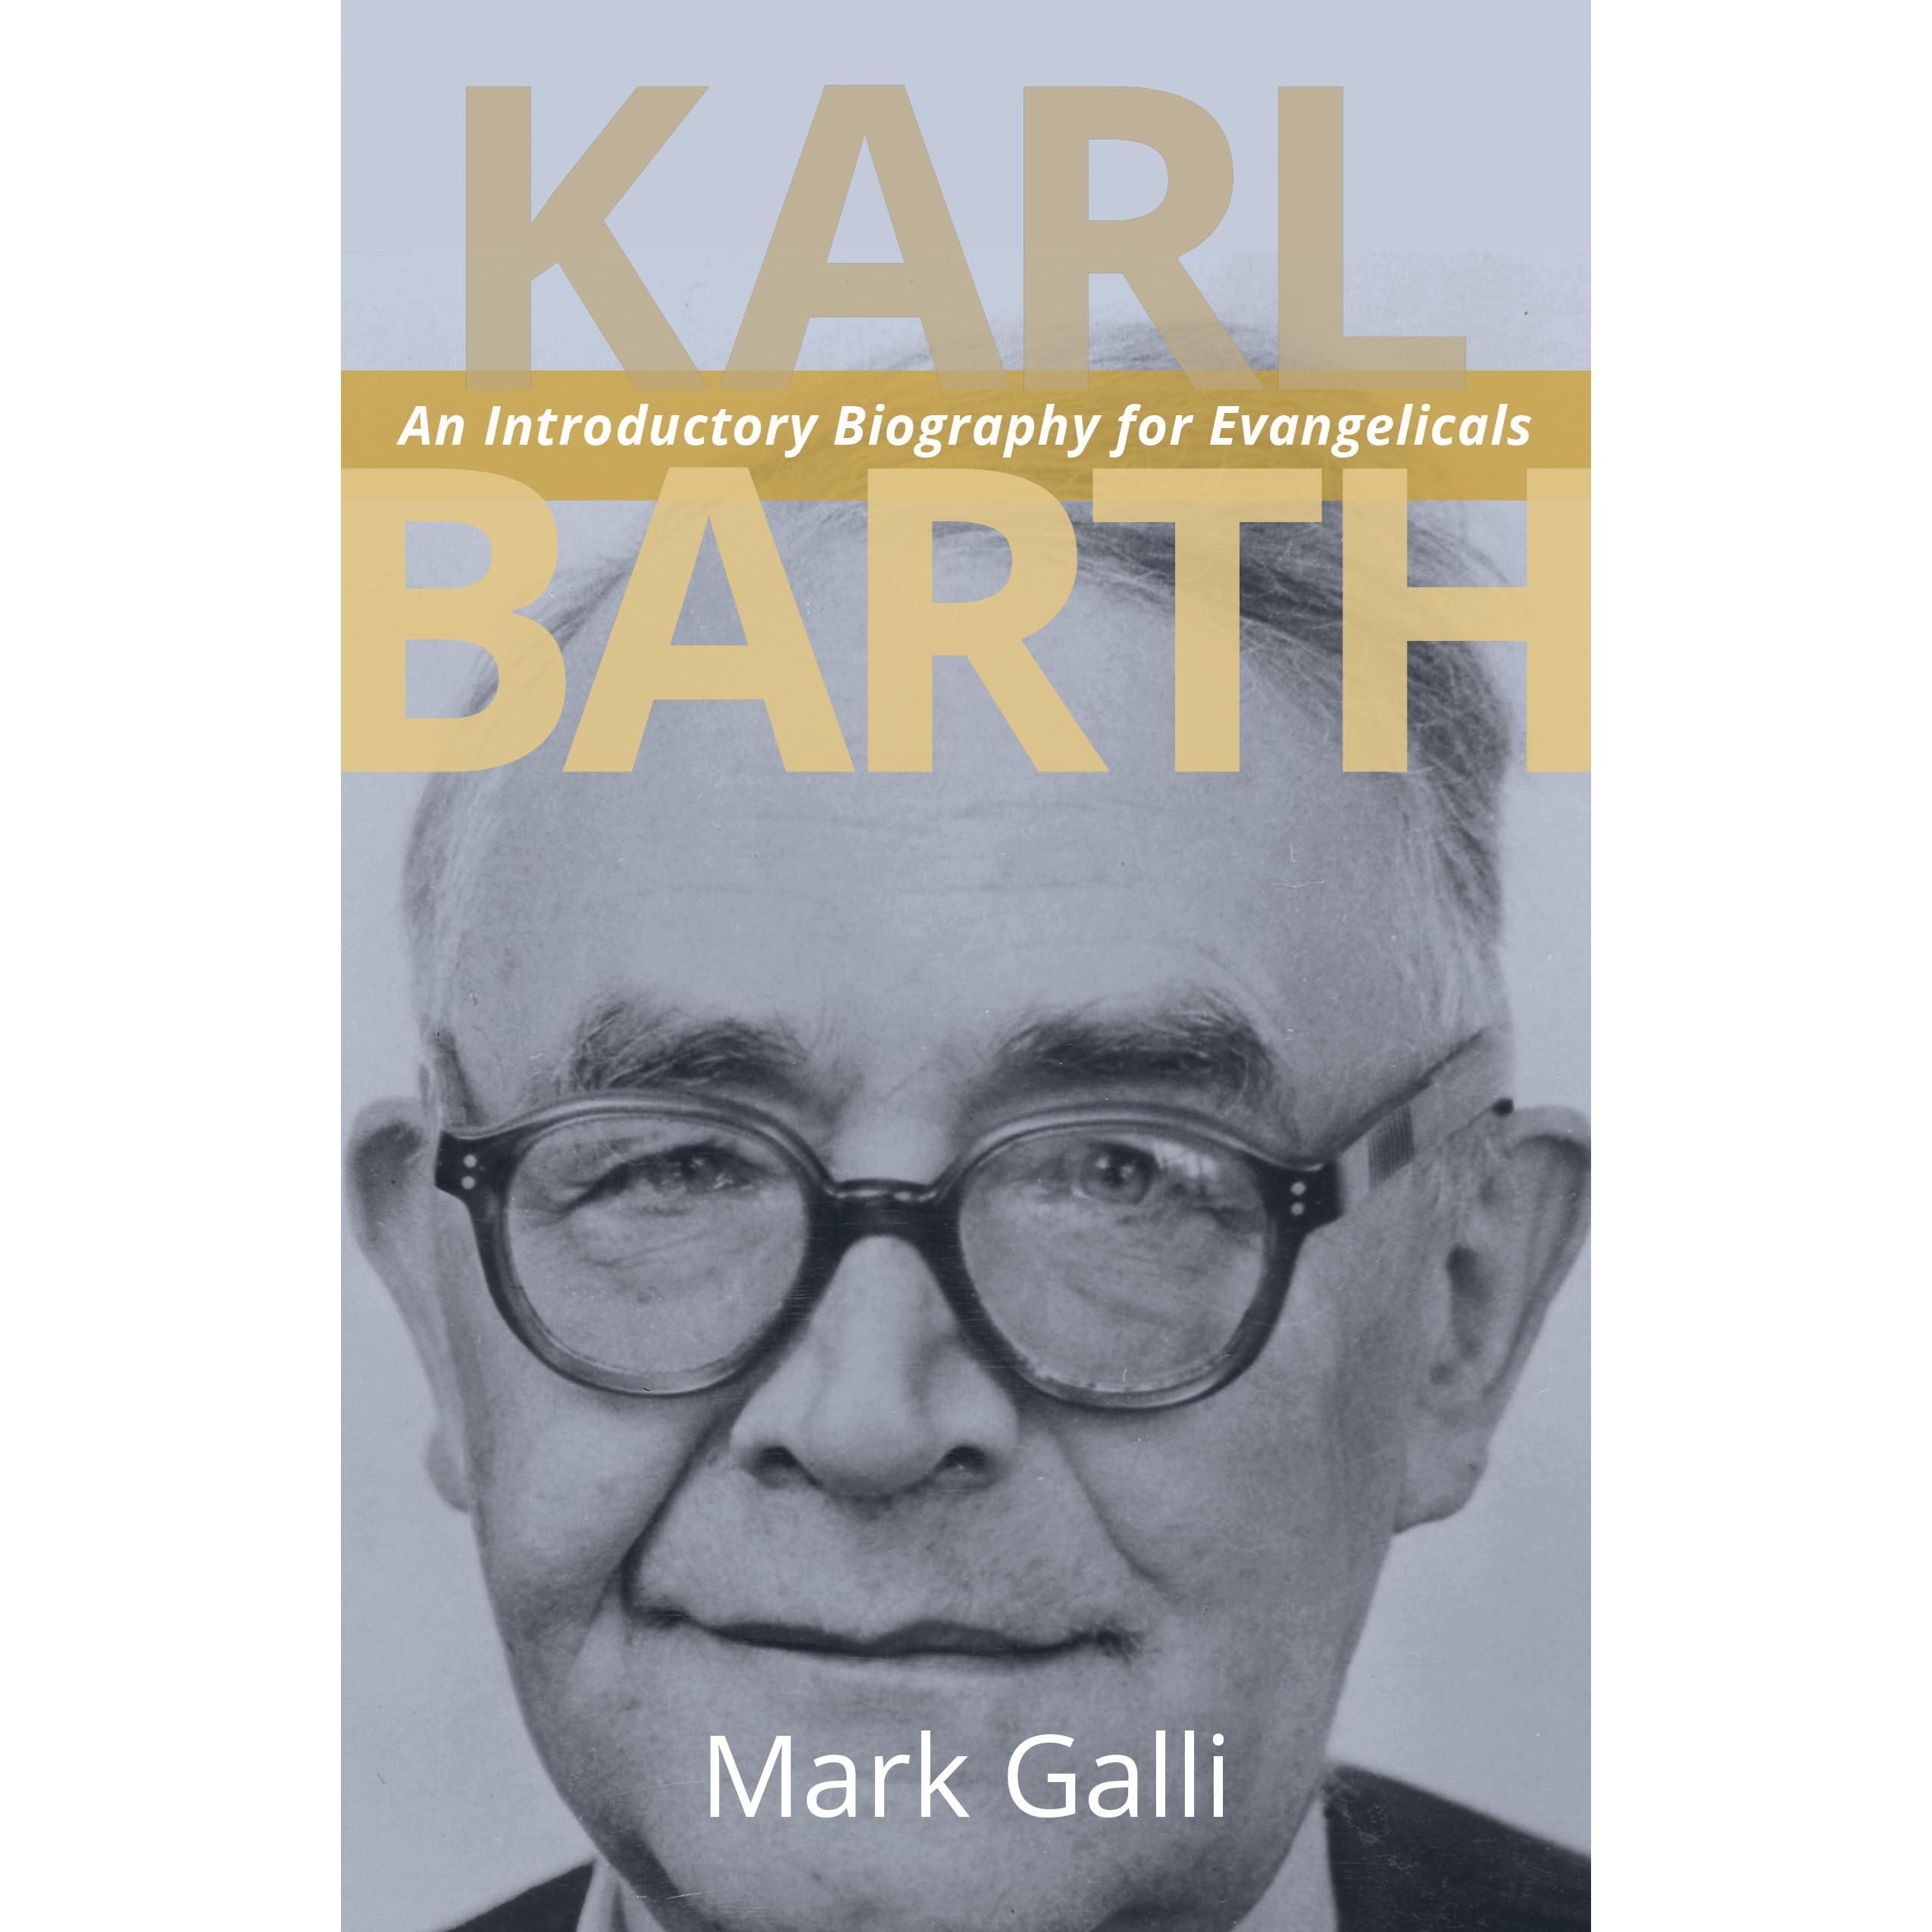 karl barth centenary essays Karl barth : centenary essays / edited by sw sykes.